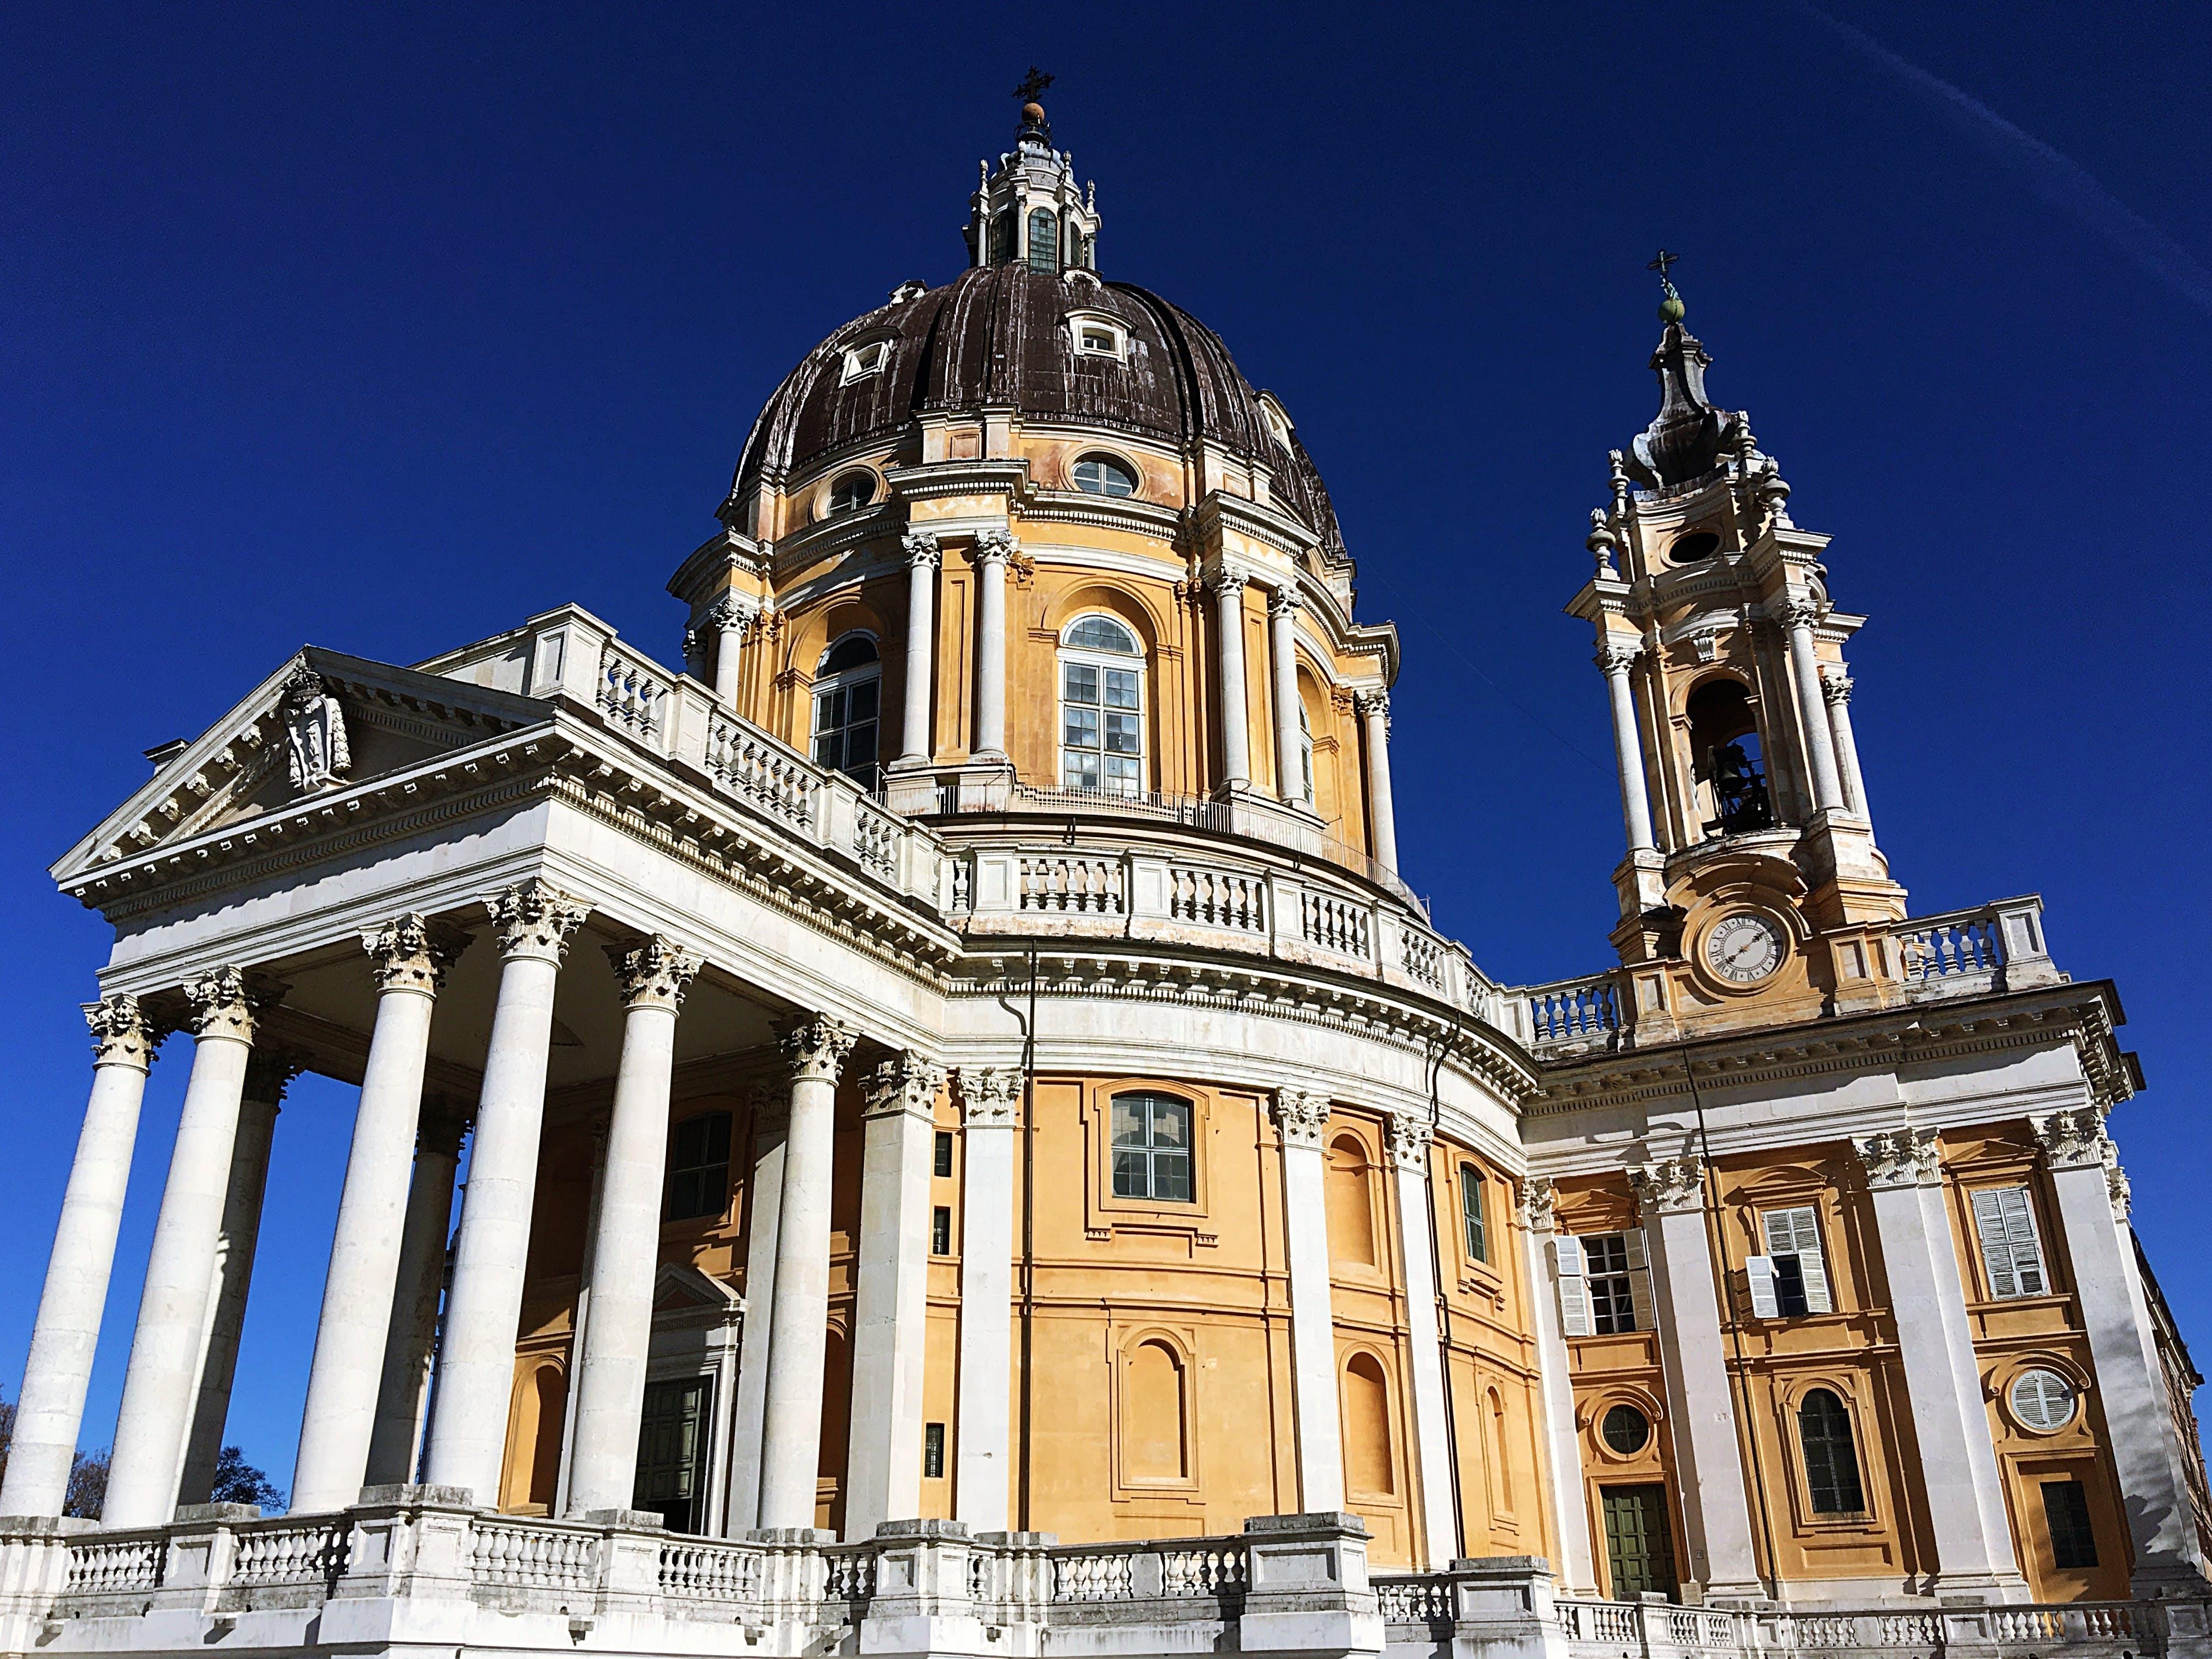 Kostenloses Stock Foto zu architektur, barock, basilika von superga, fassade